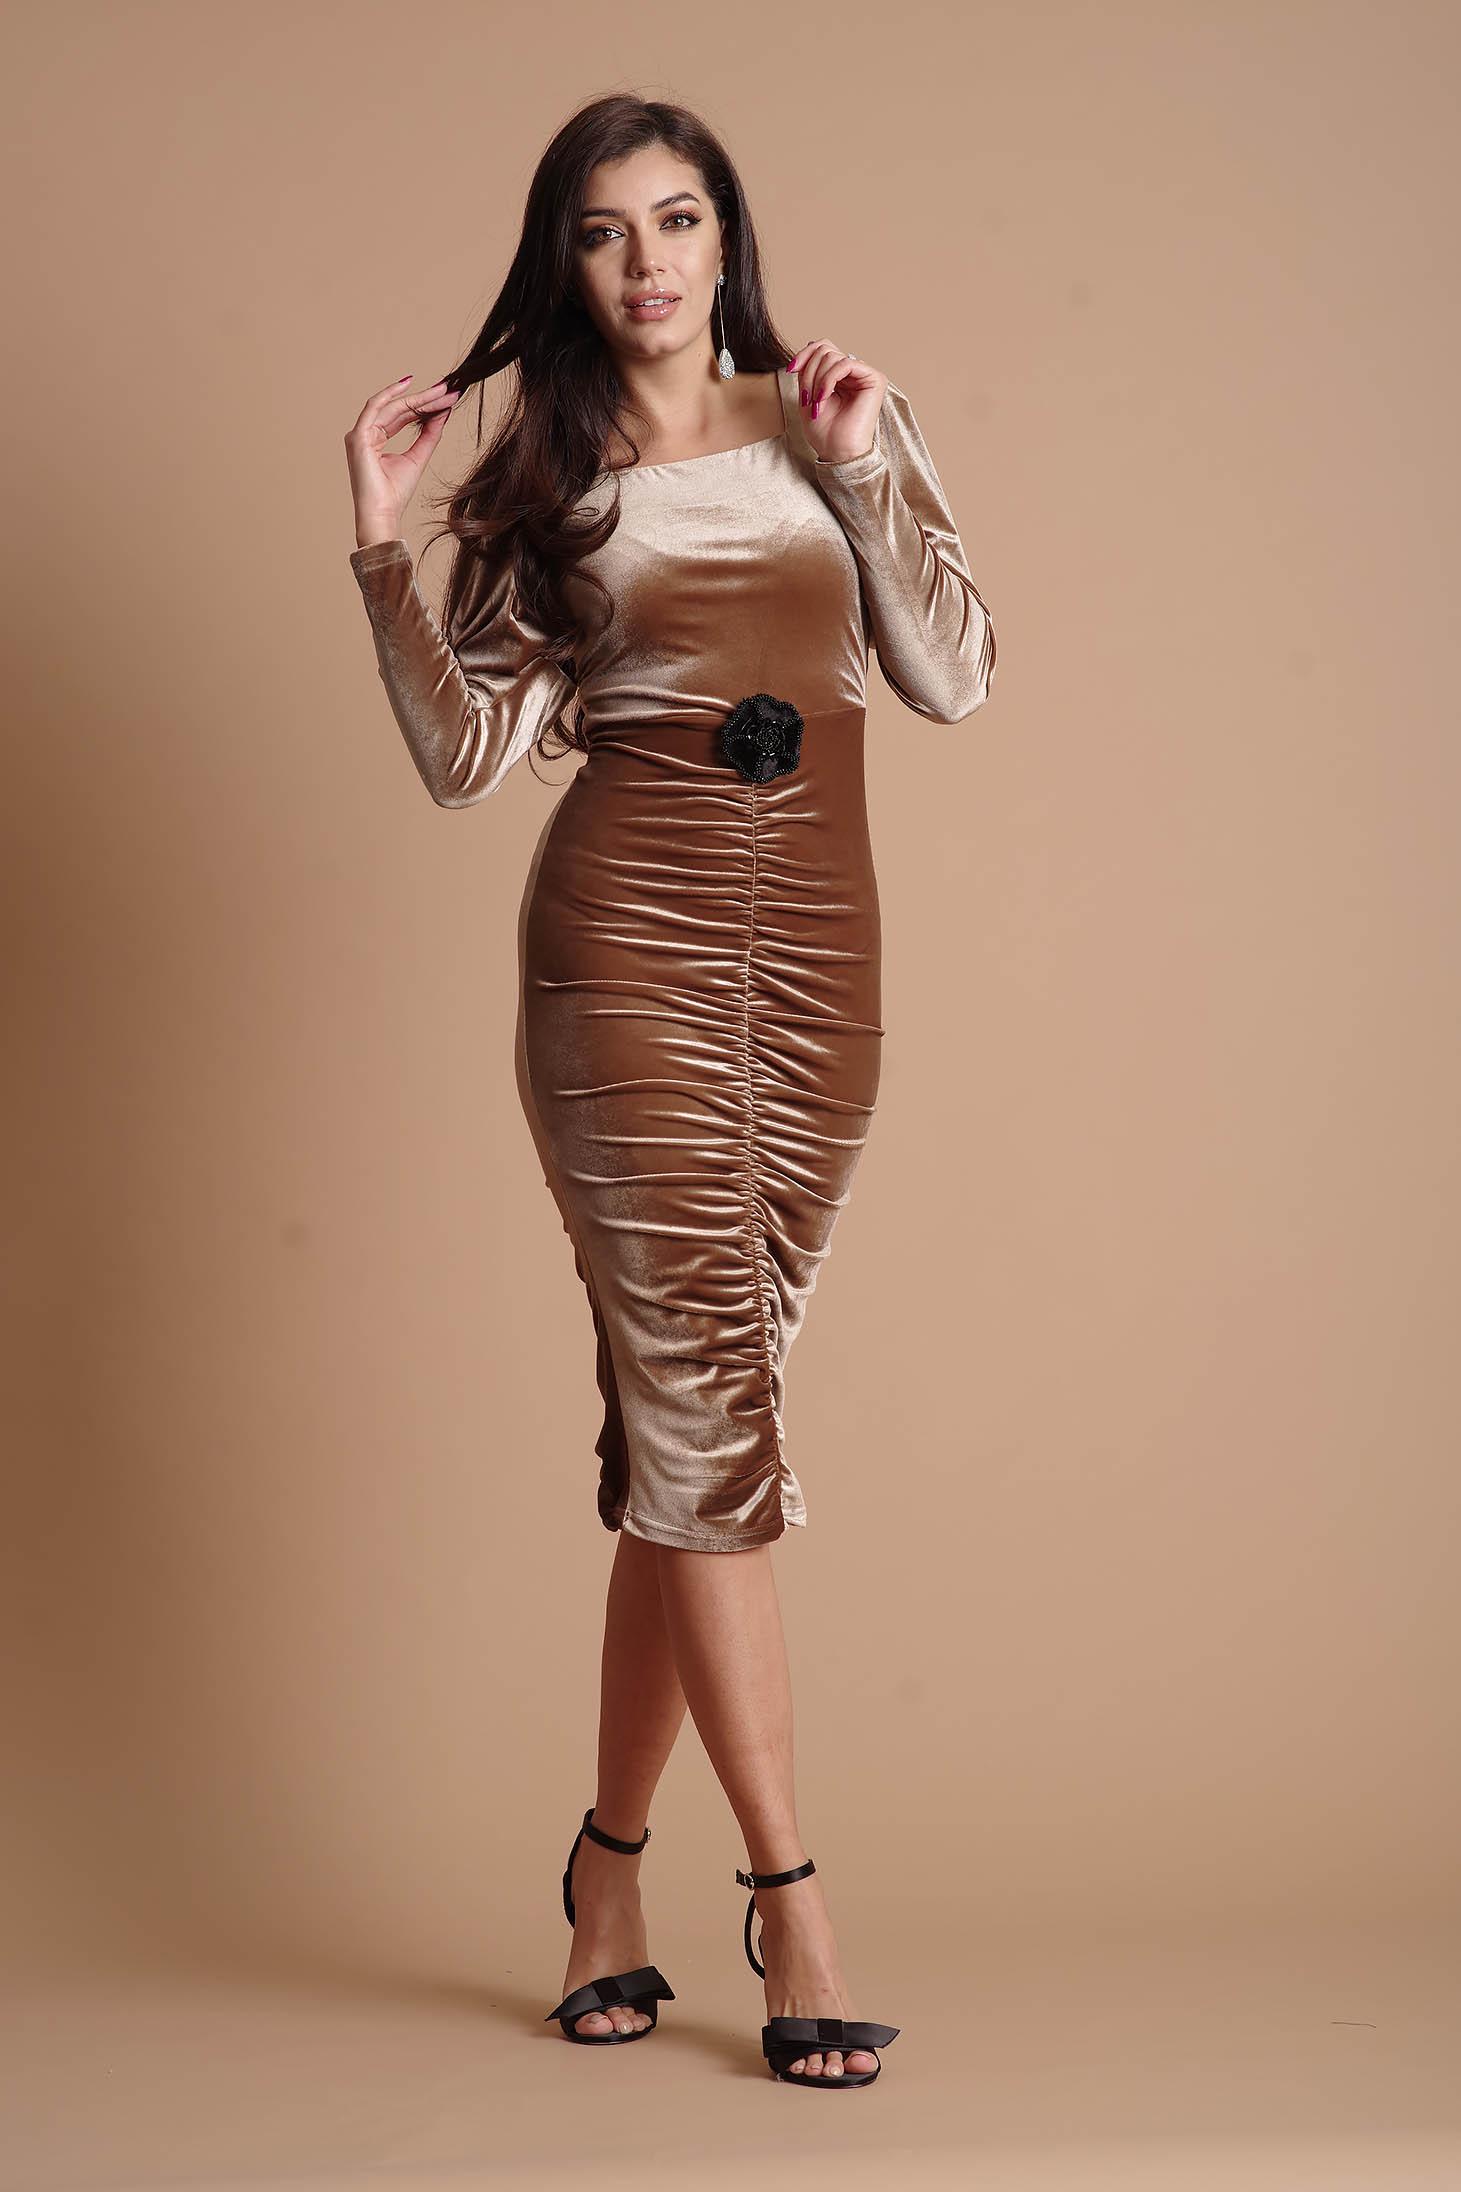 Cream dress from velvet long sleeved occasional pencil flower shaped accessory